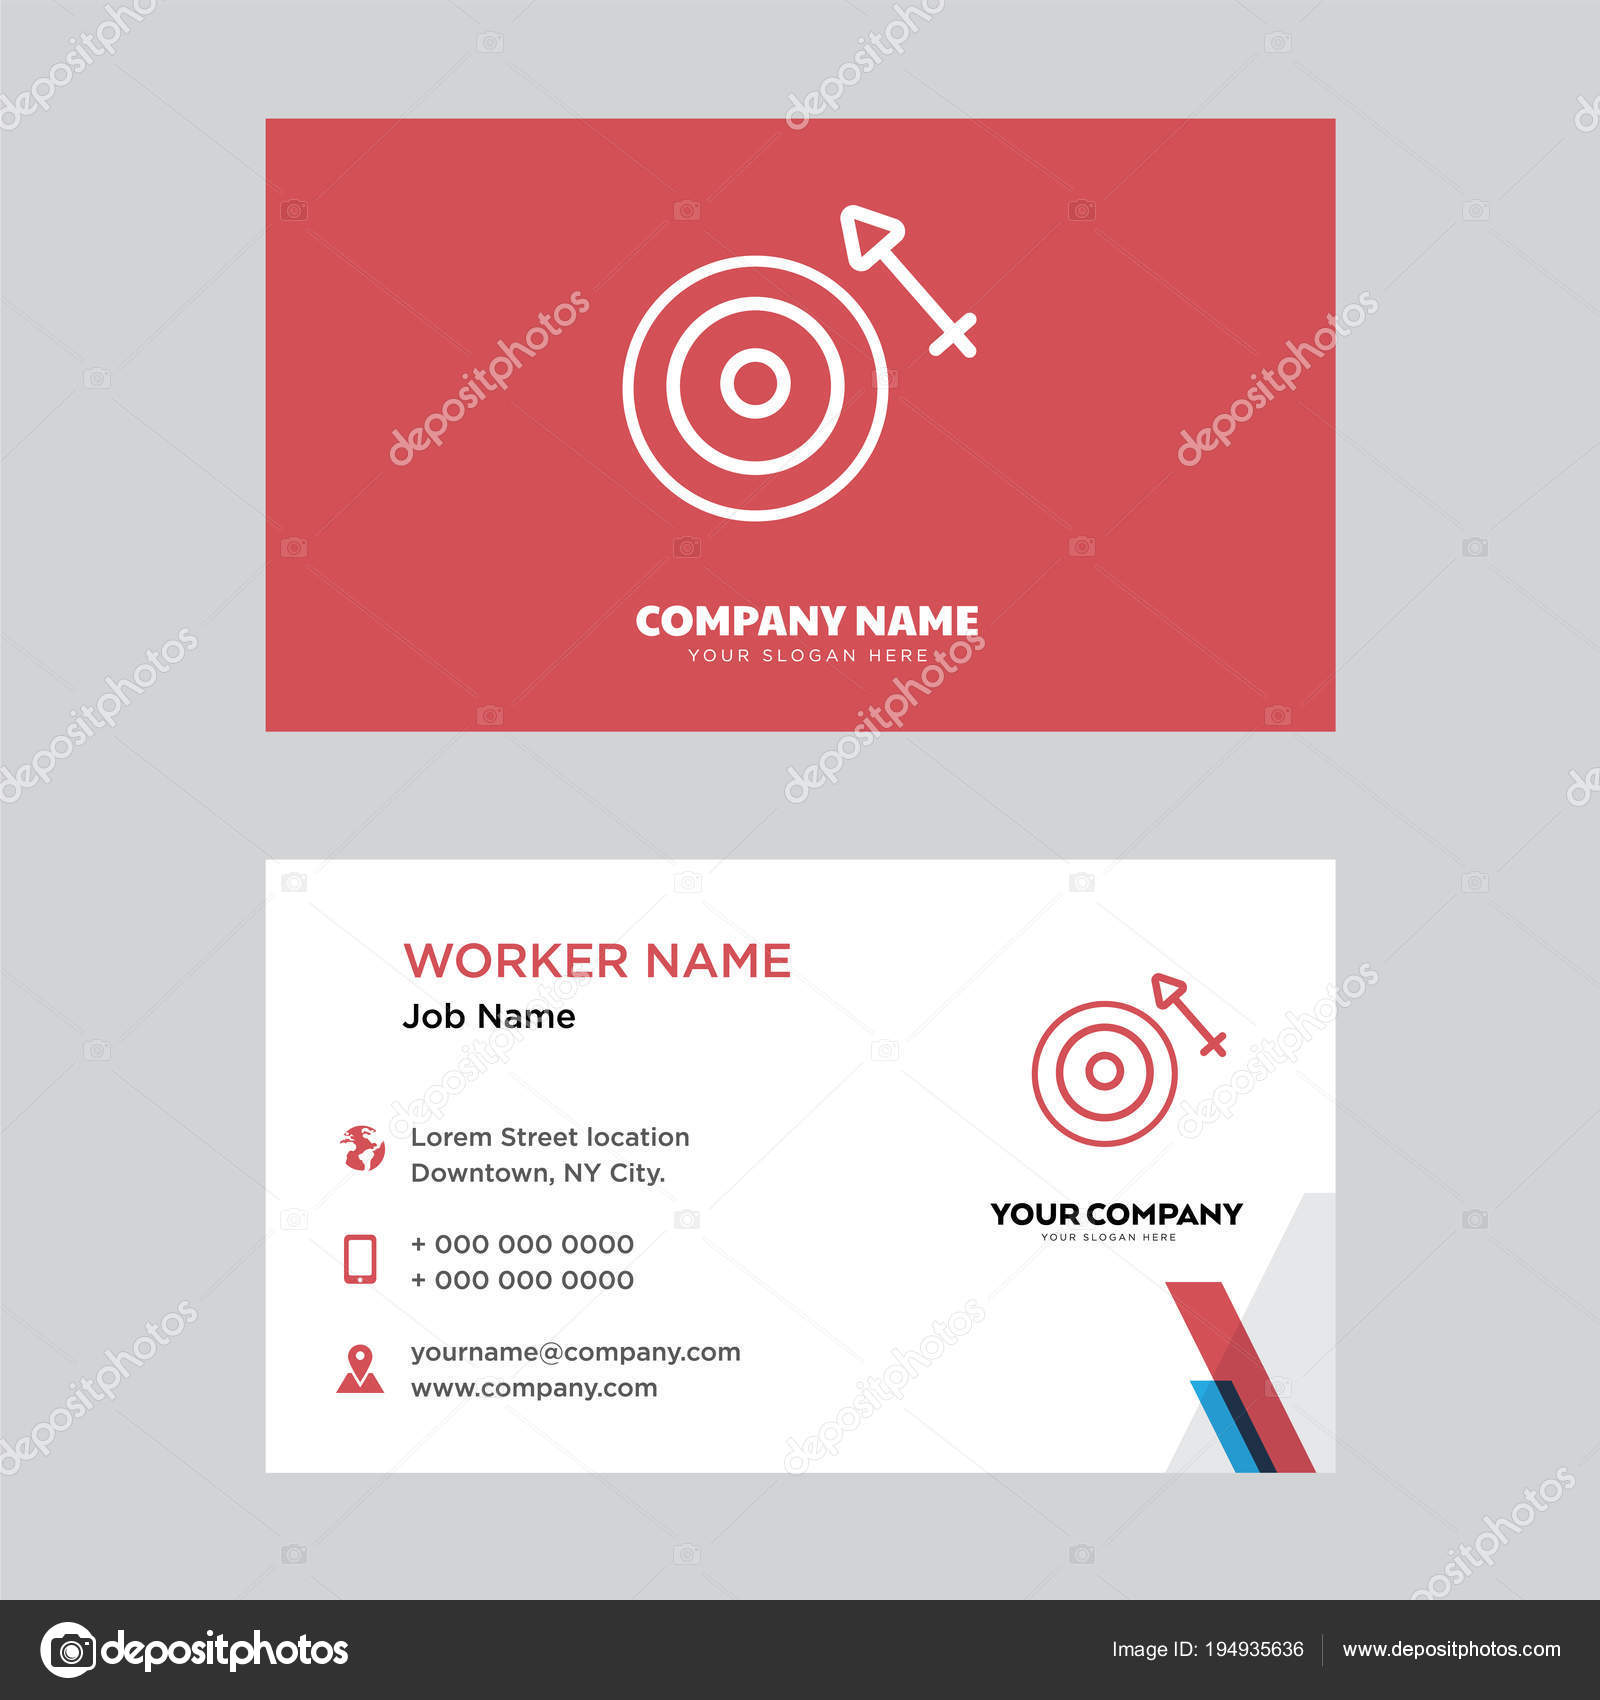 Target business card design stock vector vectorbest 194935636 target business card design stock vector colourmoves